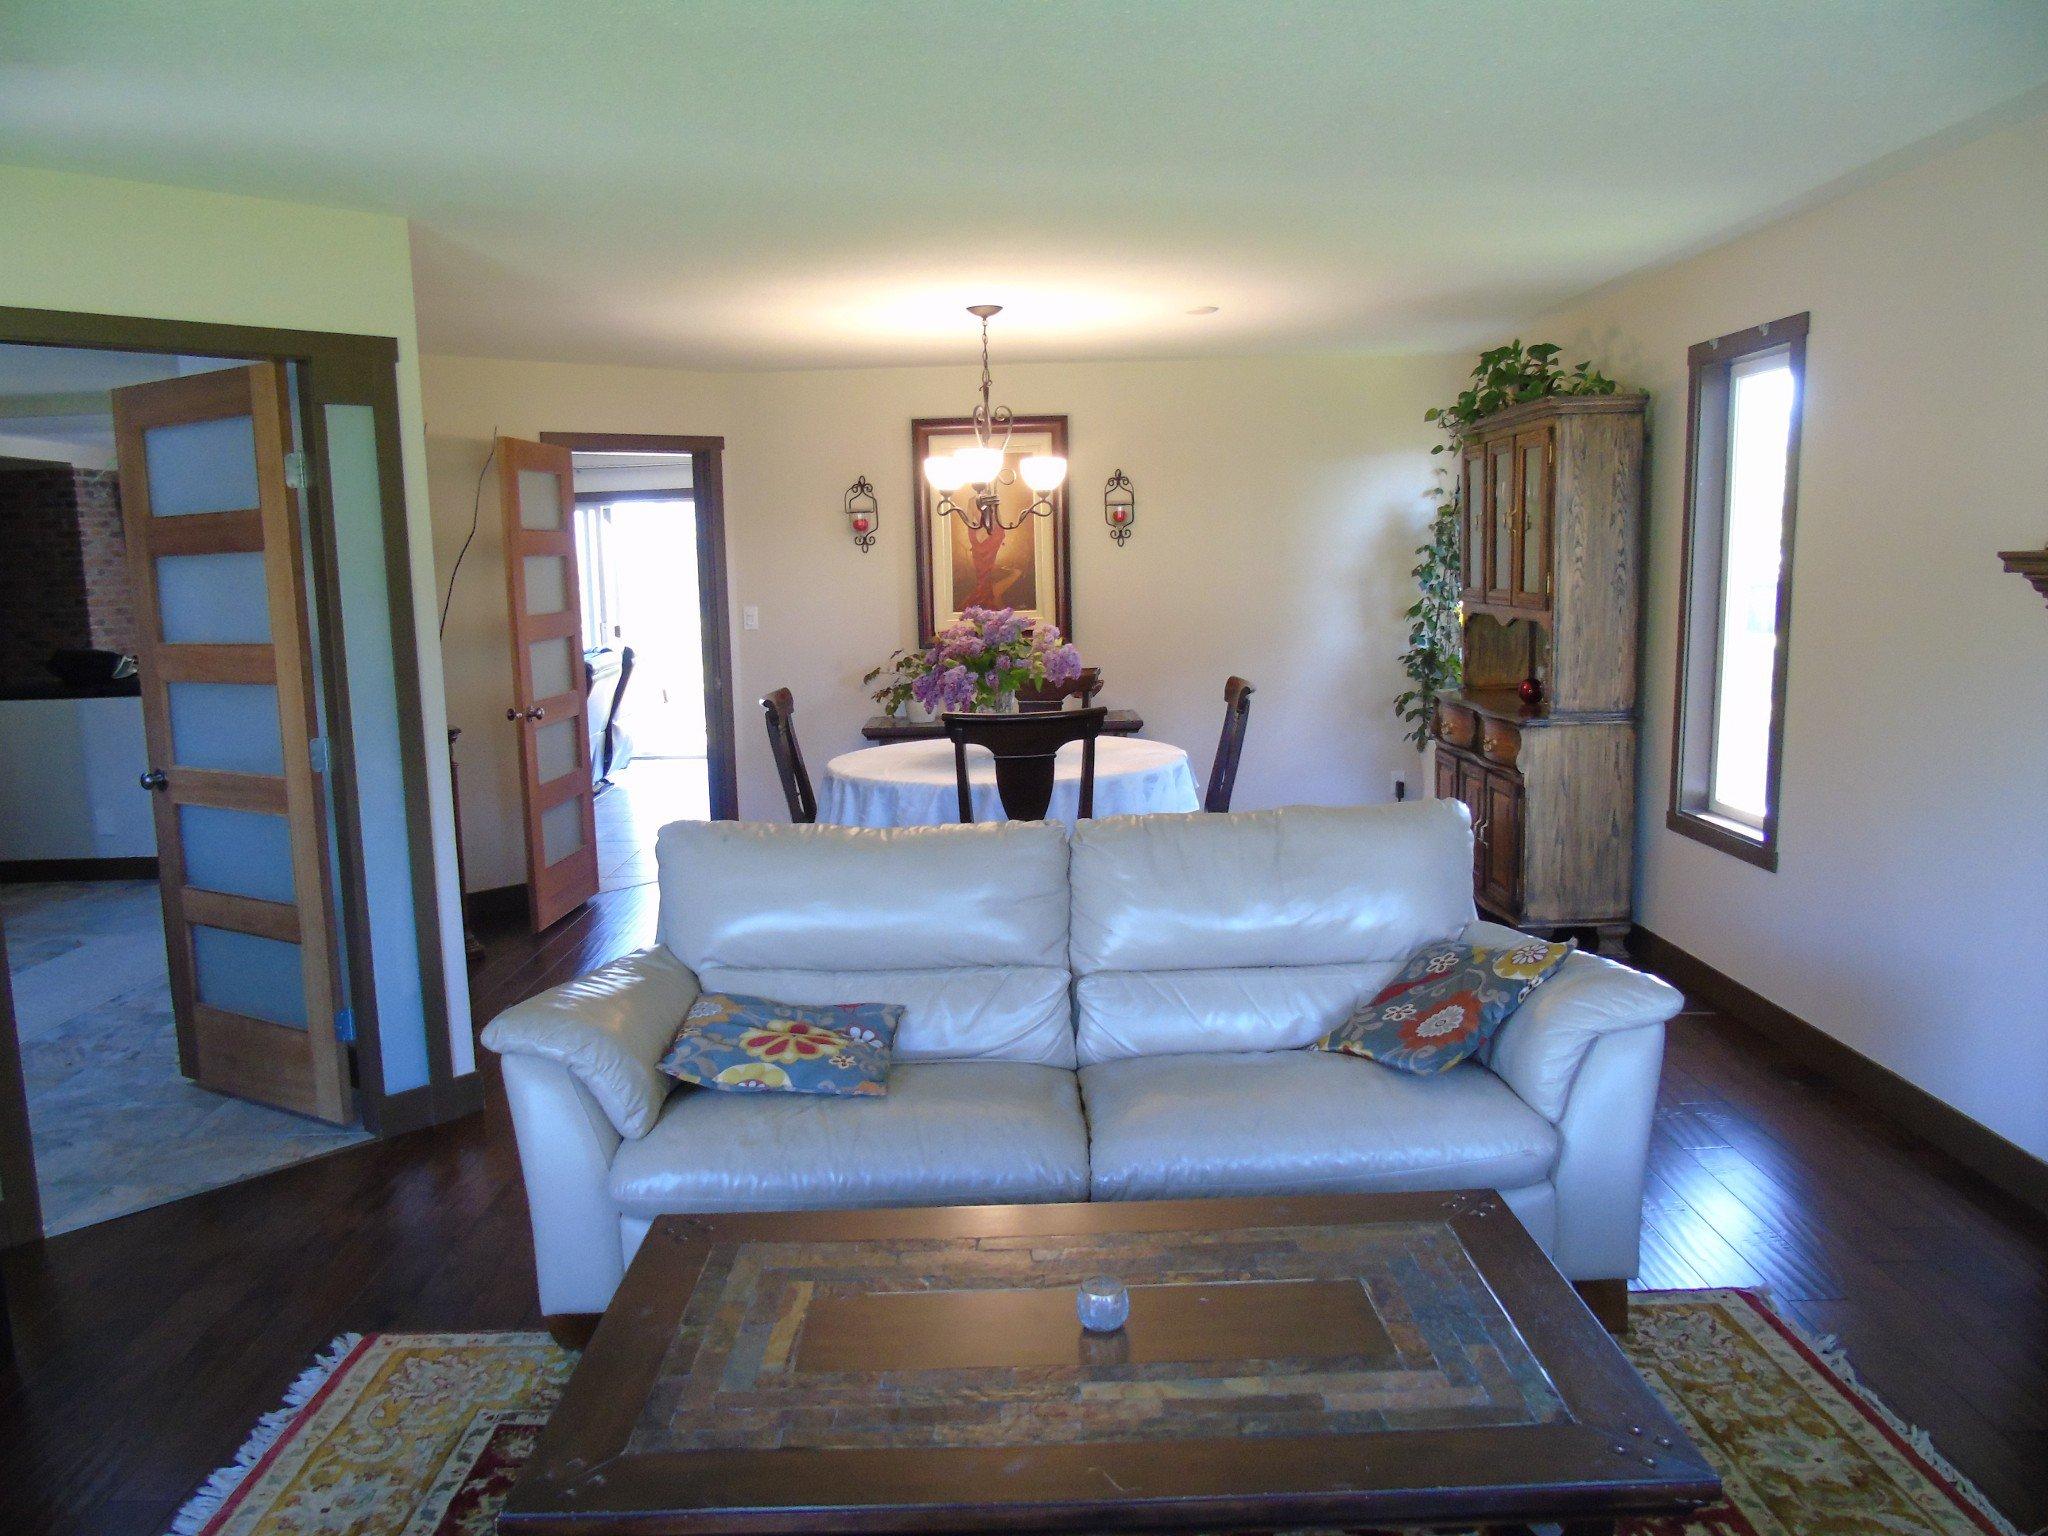 Photo 4: Photos: 6490 Barnhartvale Road in Kamloops: Barnhartvale House for sale : MLS®# New